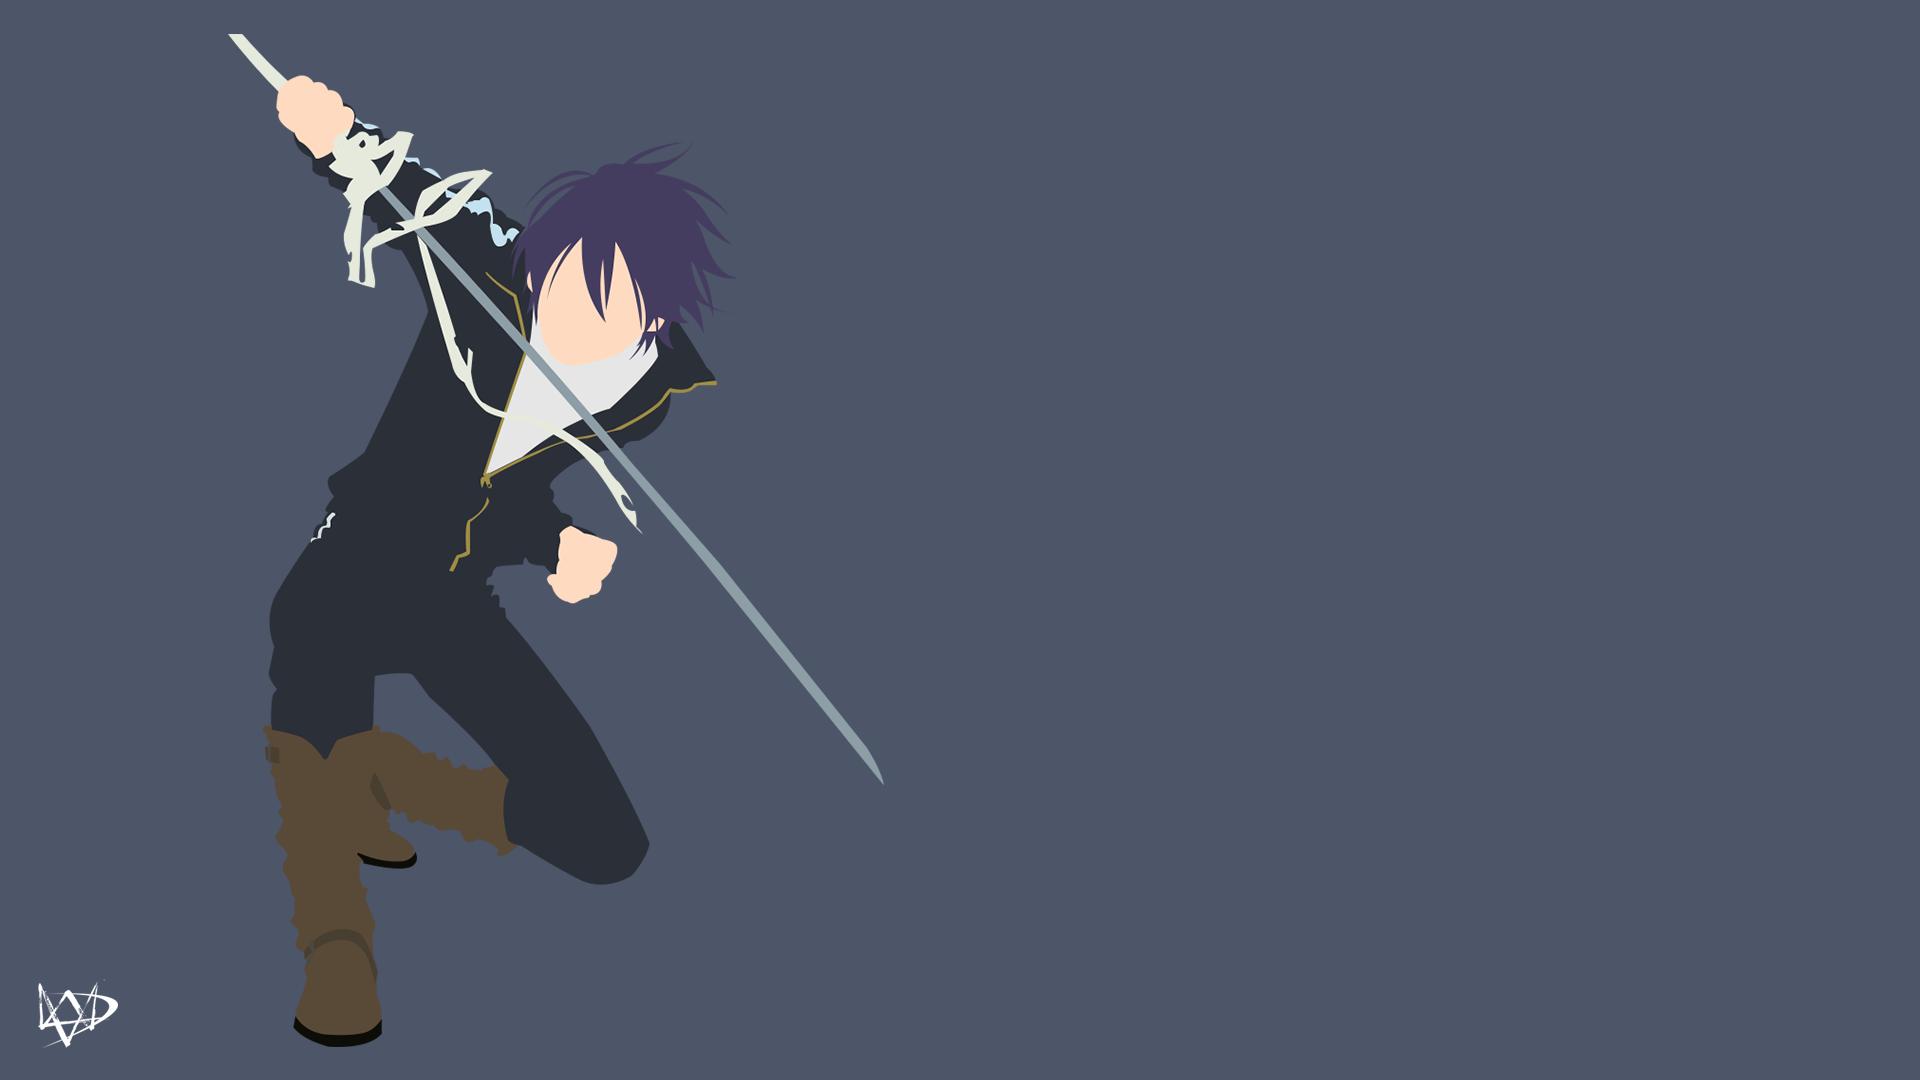 Yato (Noragami Aragoto) Minimalist Anime Wallpaper by ...